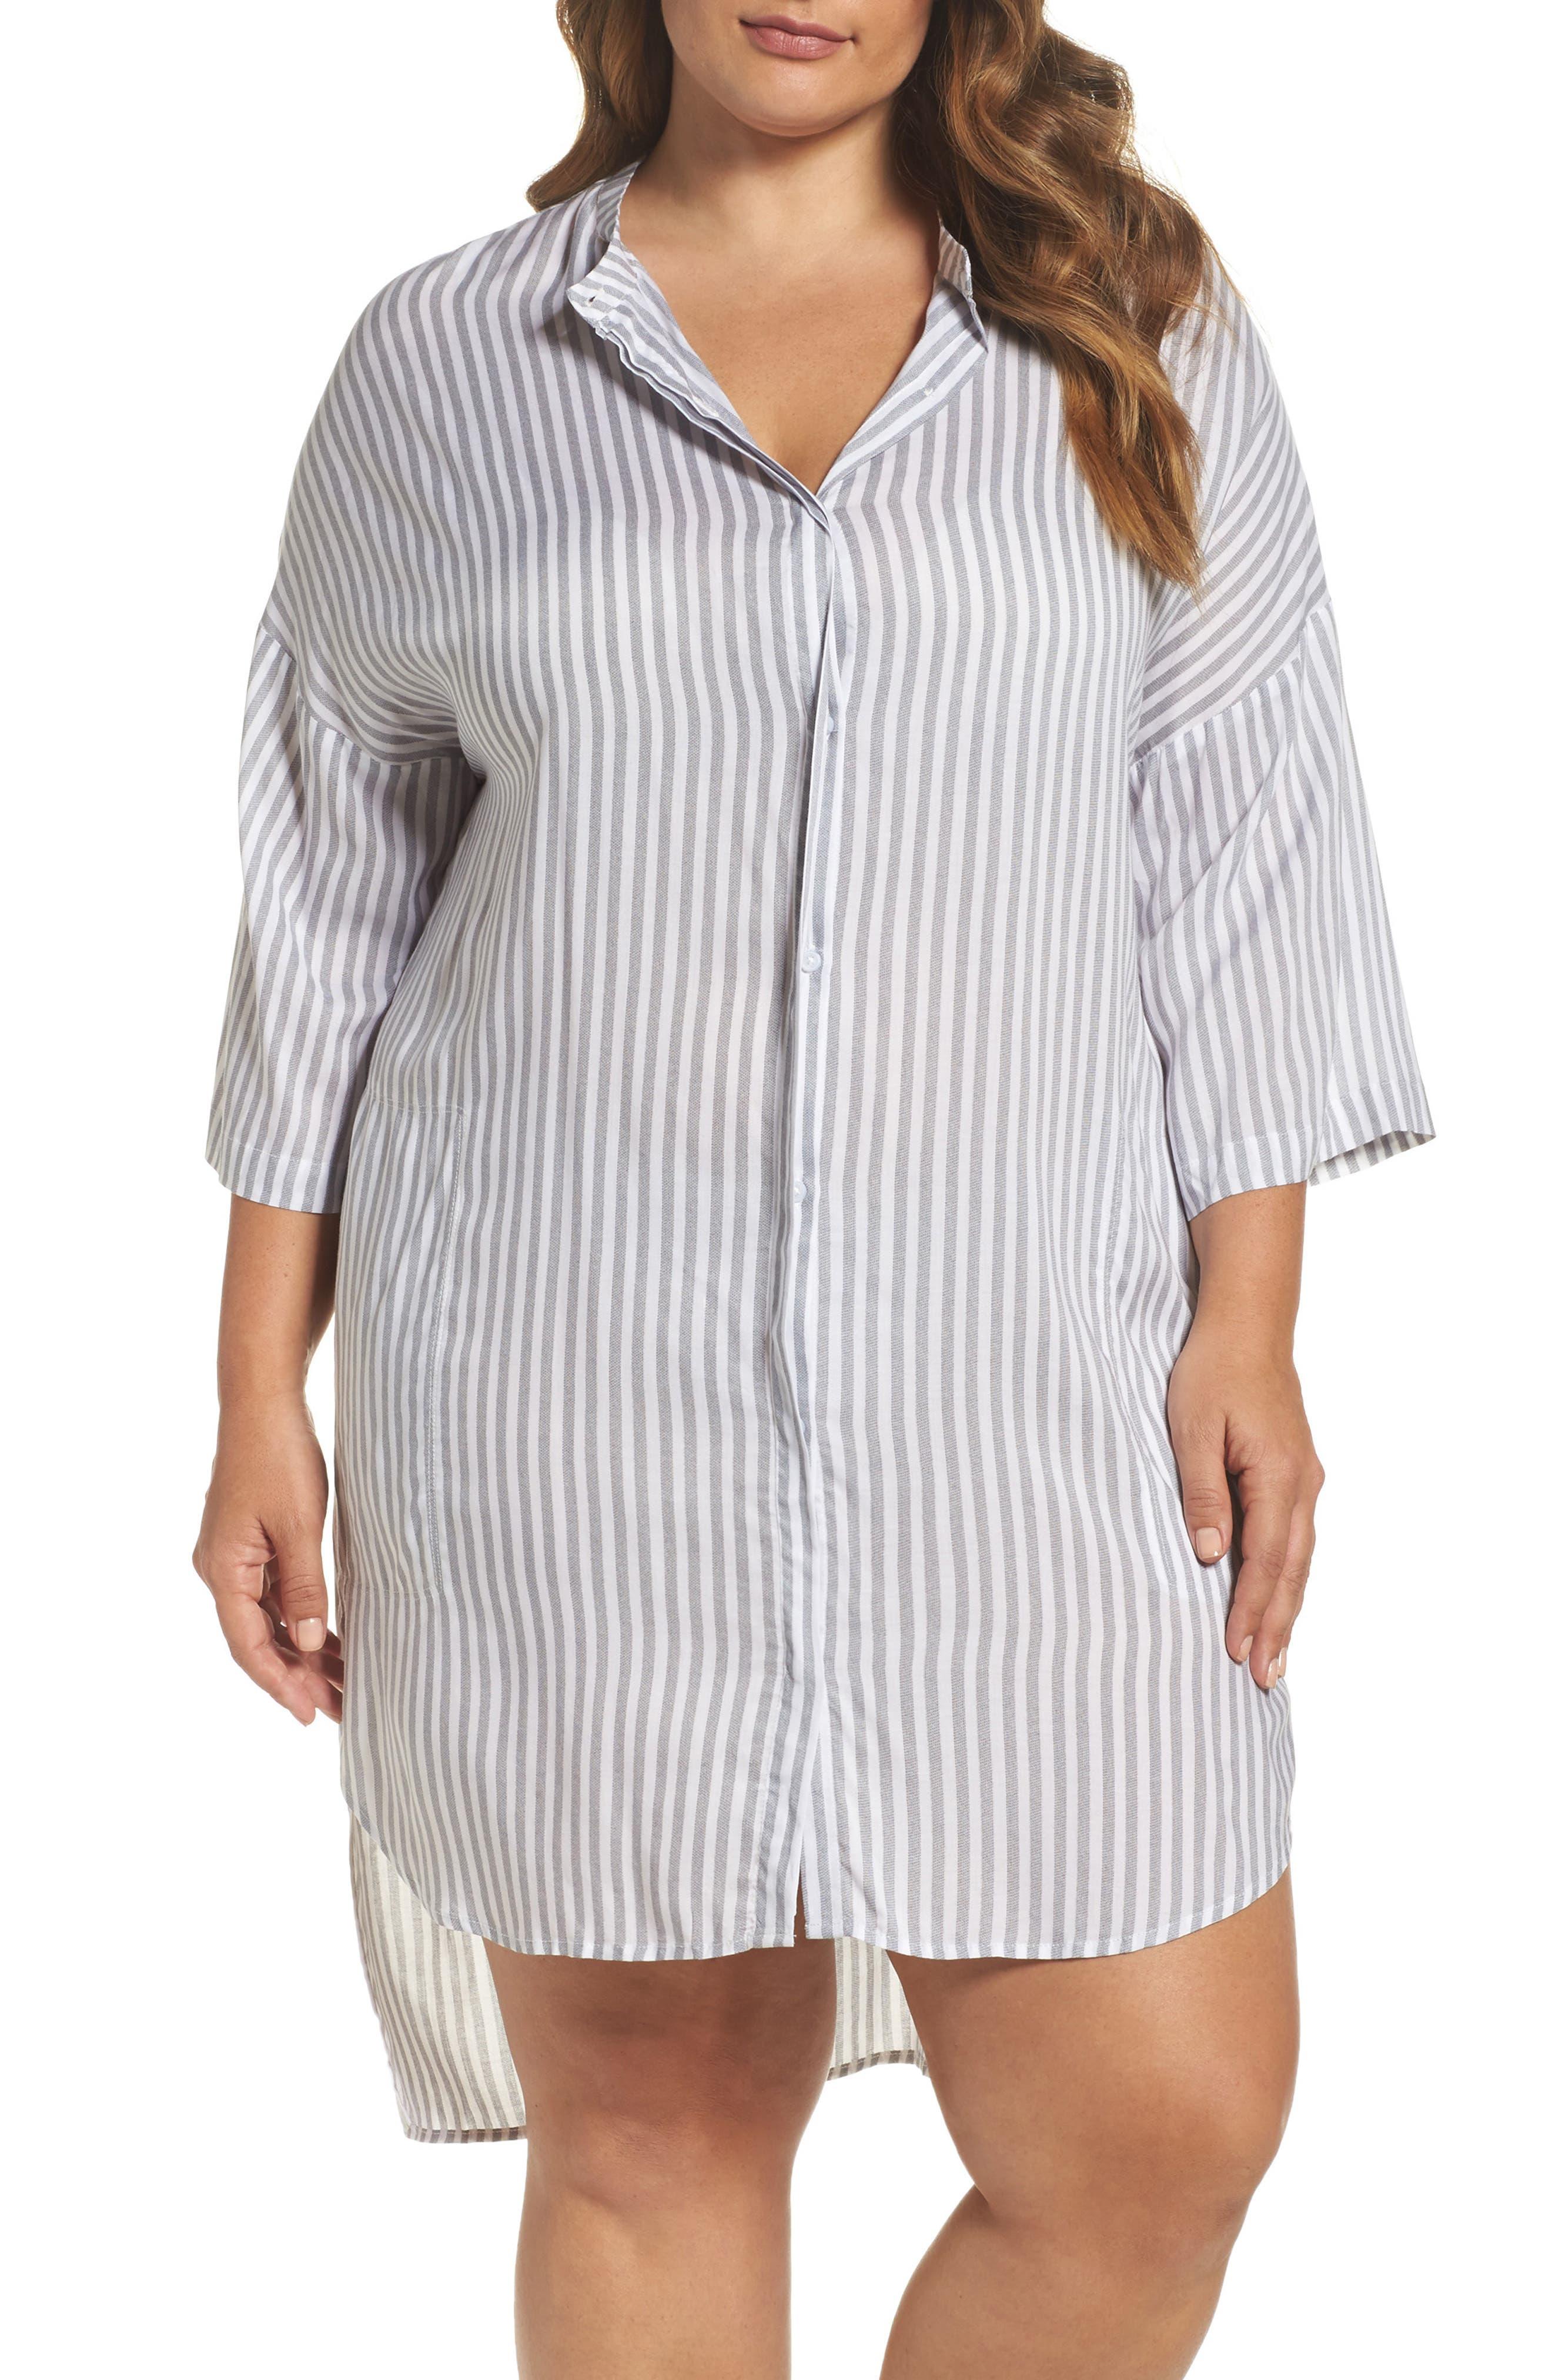 DKNY Collarless Nightshirt (Plus Size)